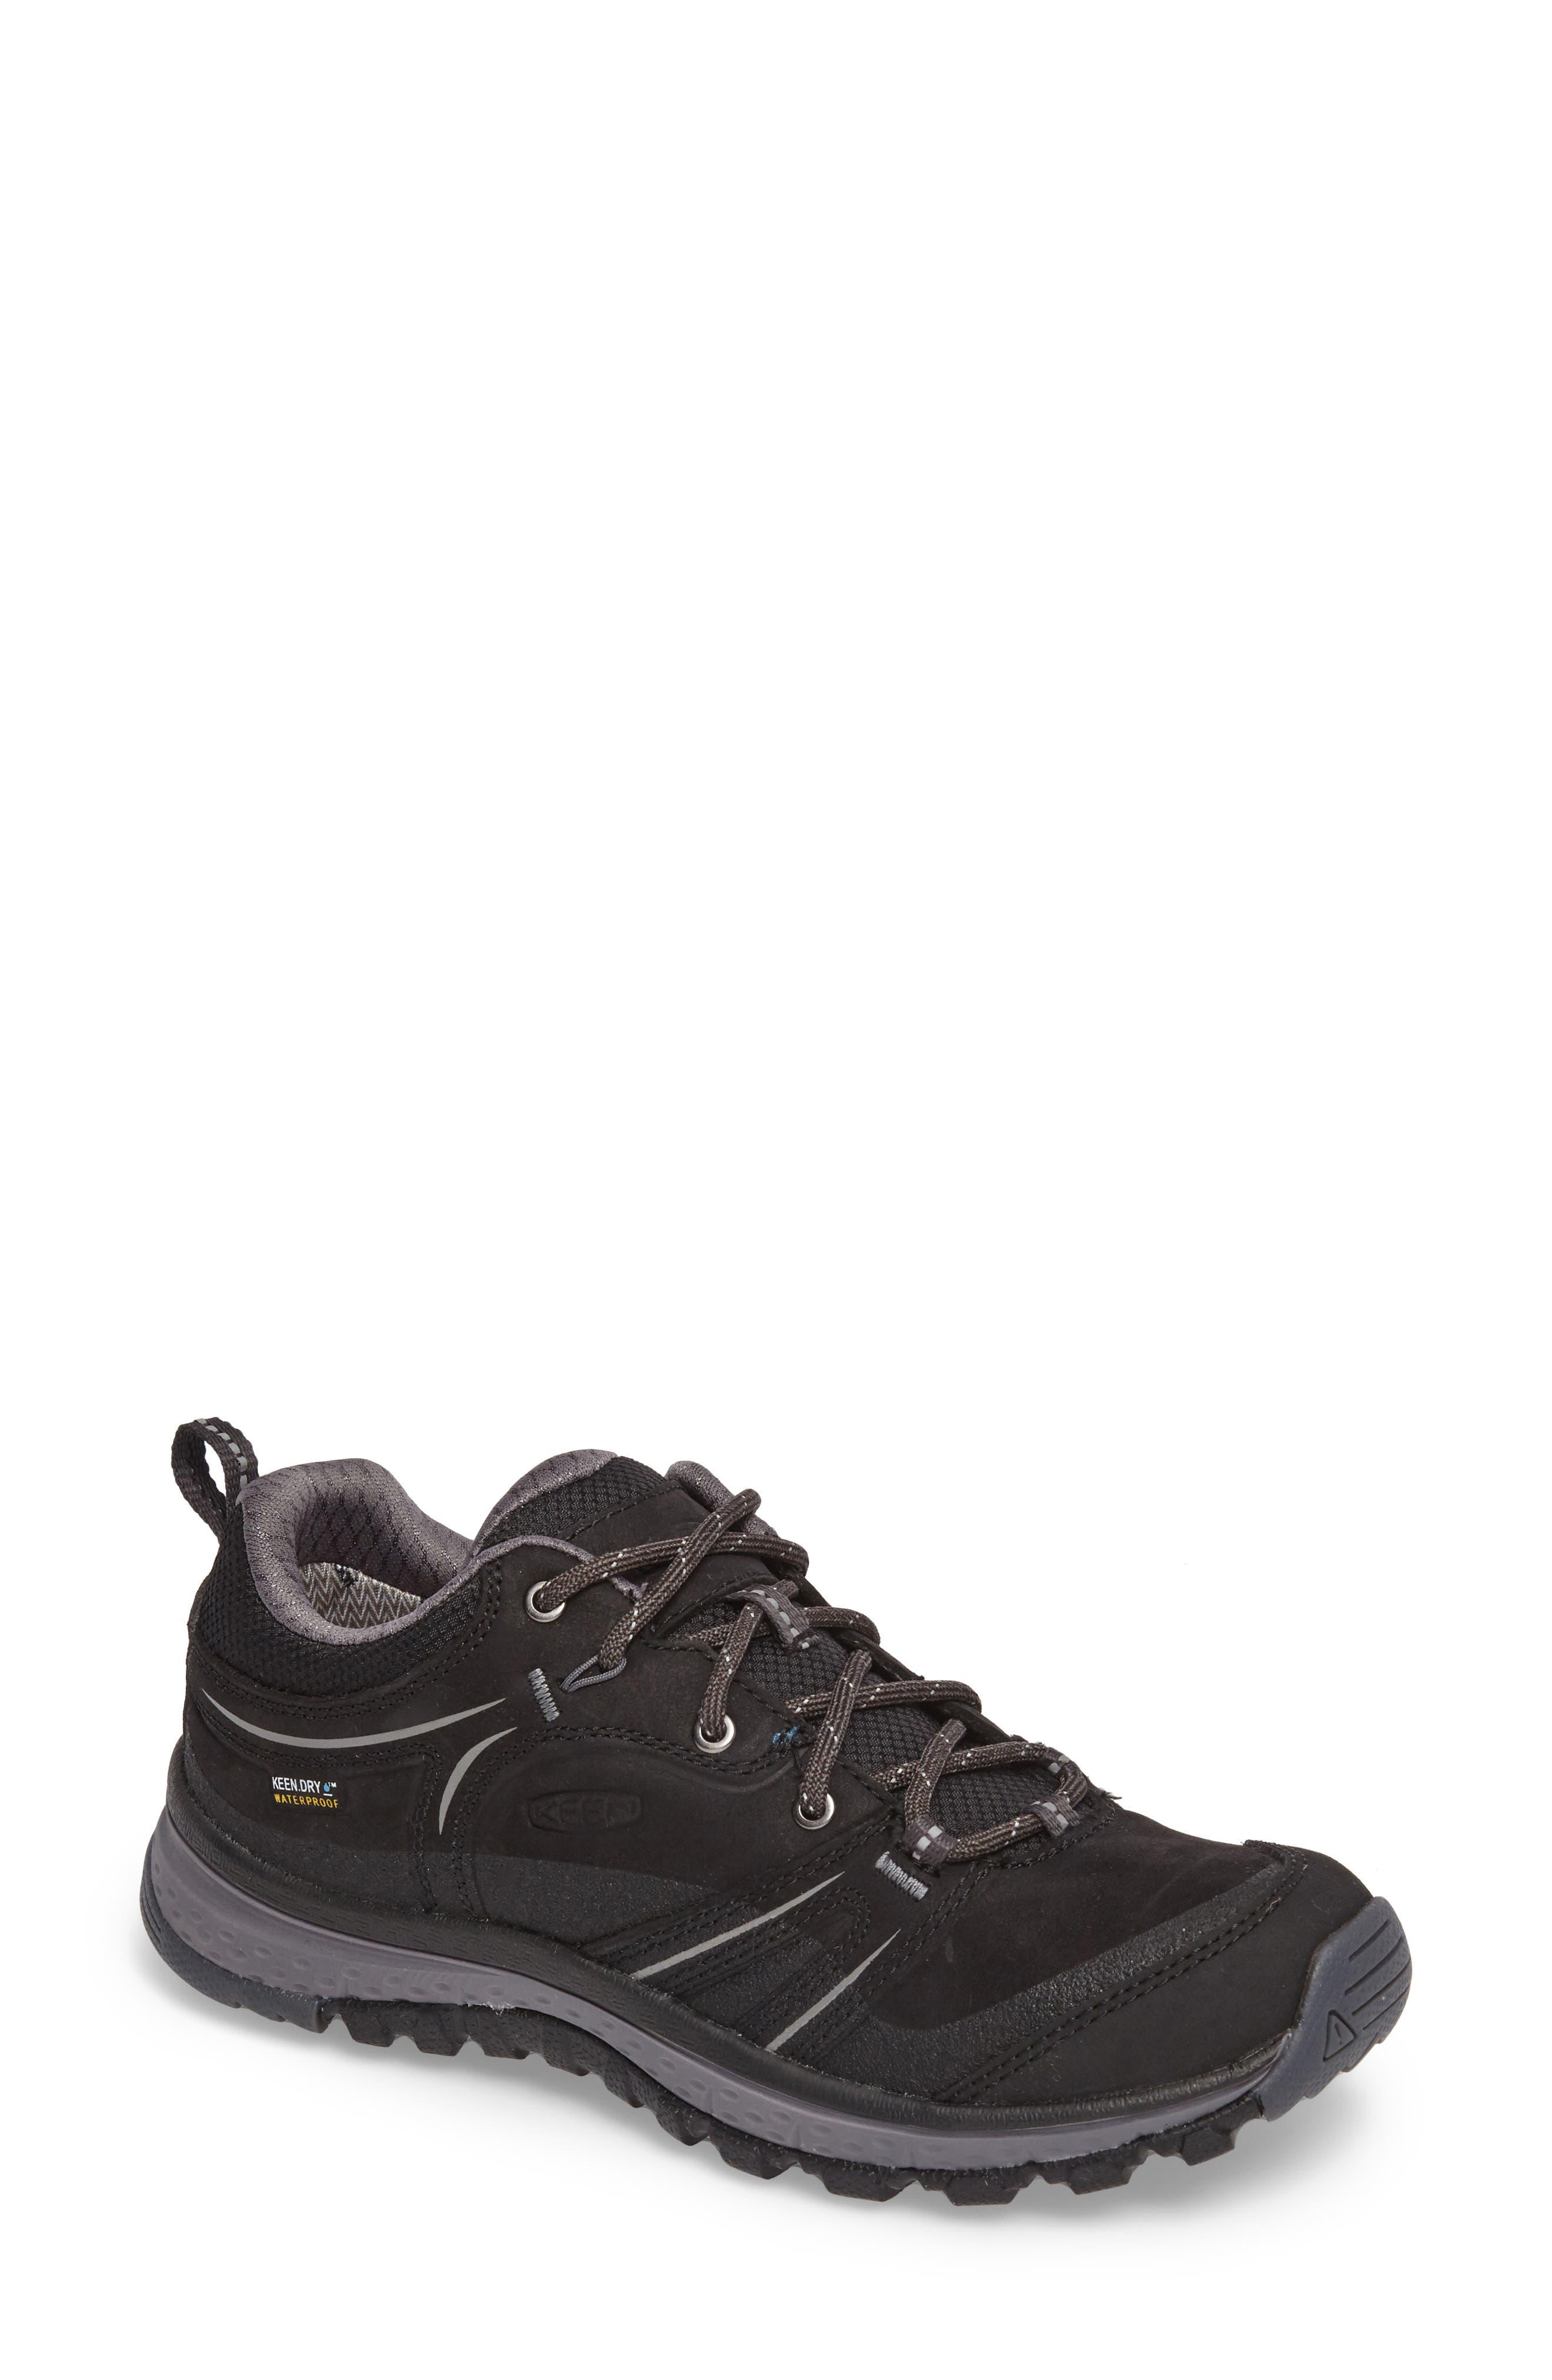 Terradora Waterproof Hiking Shoe,                             Main thumbnail 1, color,                             012